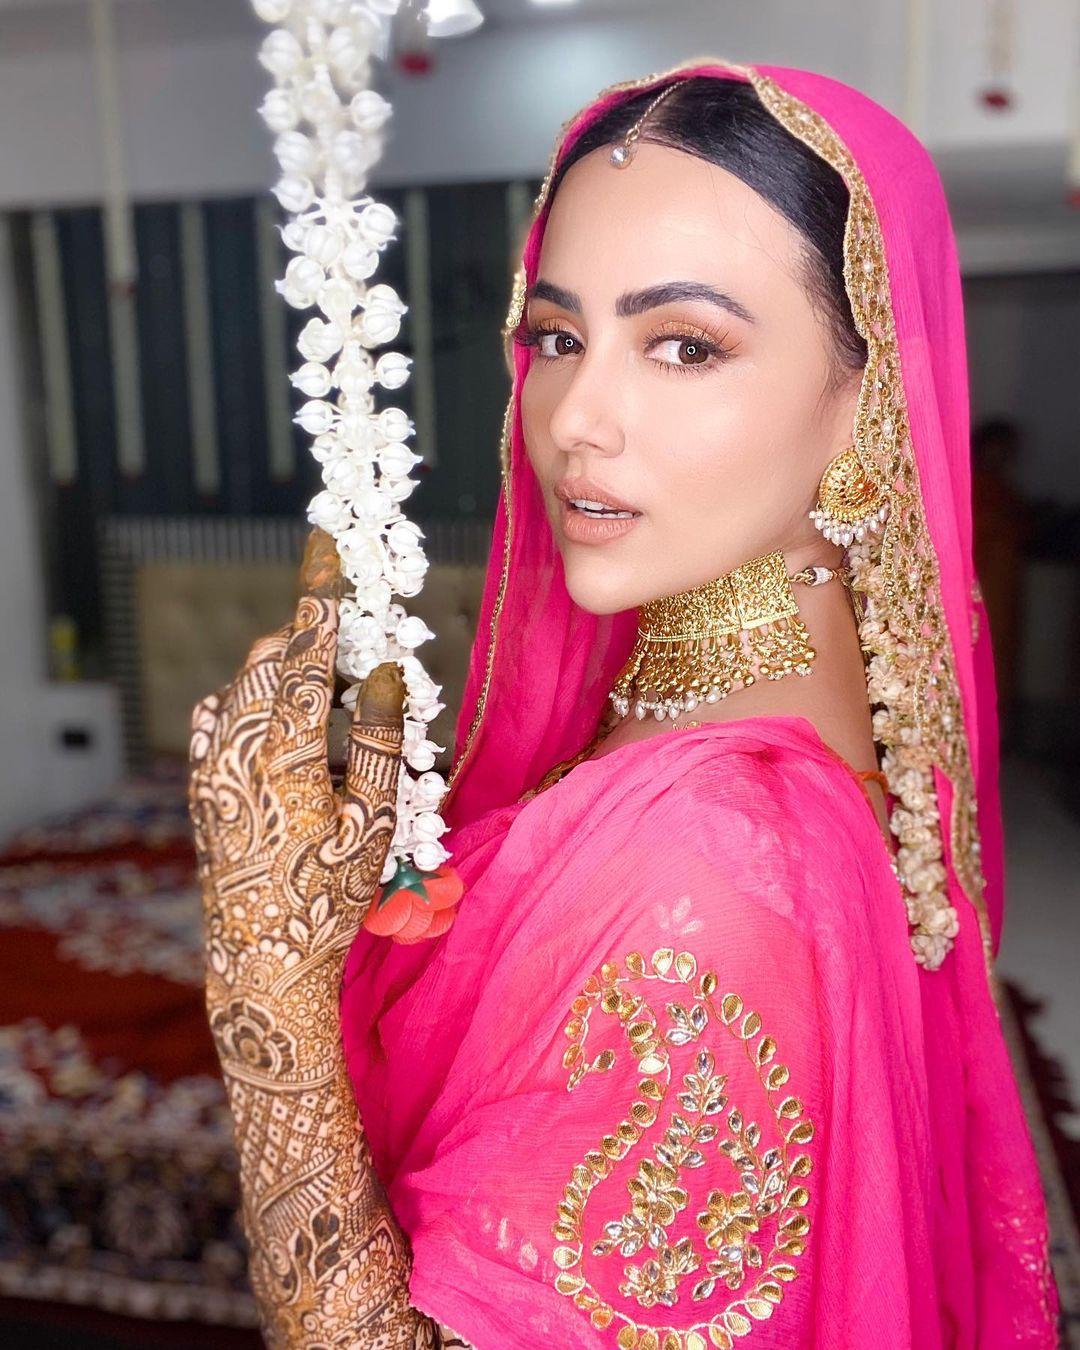 Sana Khan with her Husband for Honeymoon in Kashmir